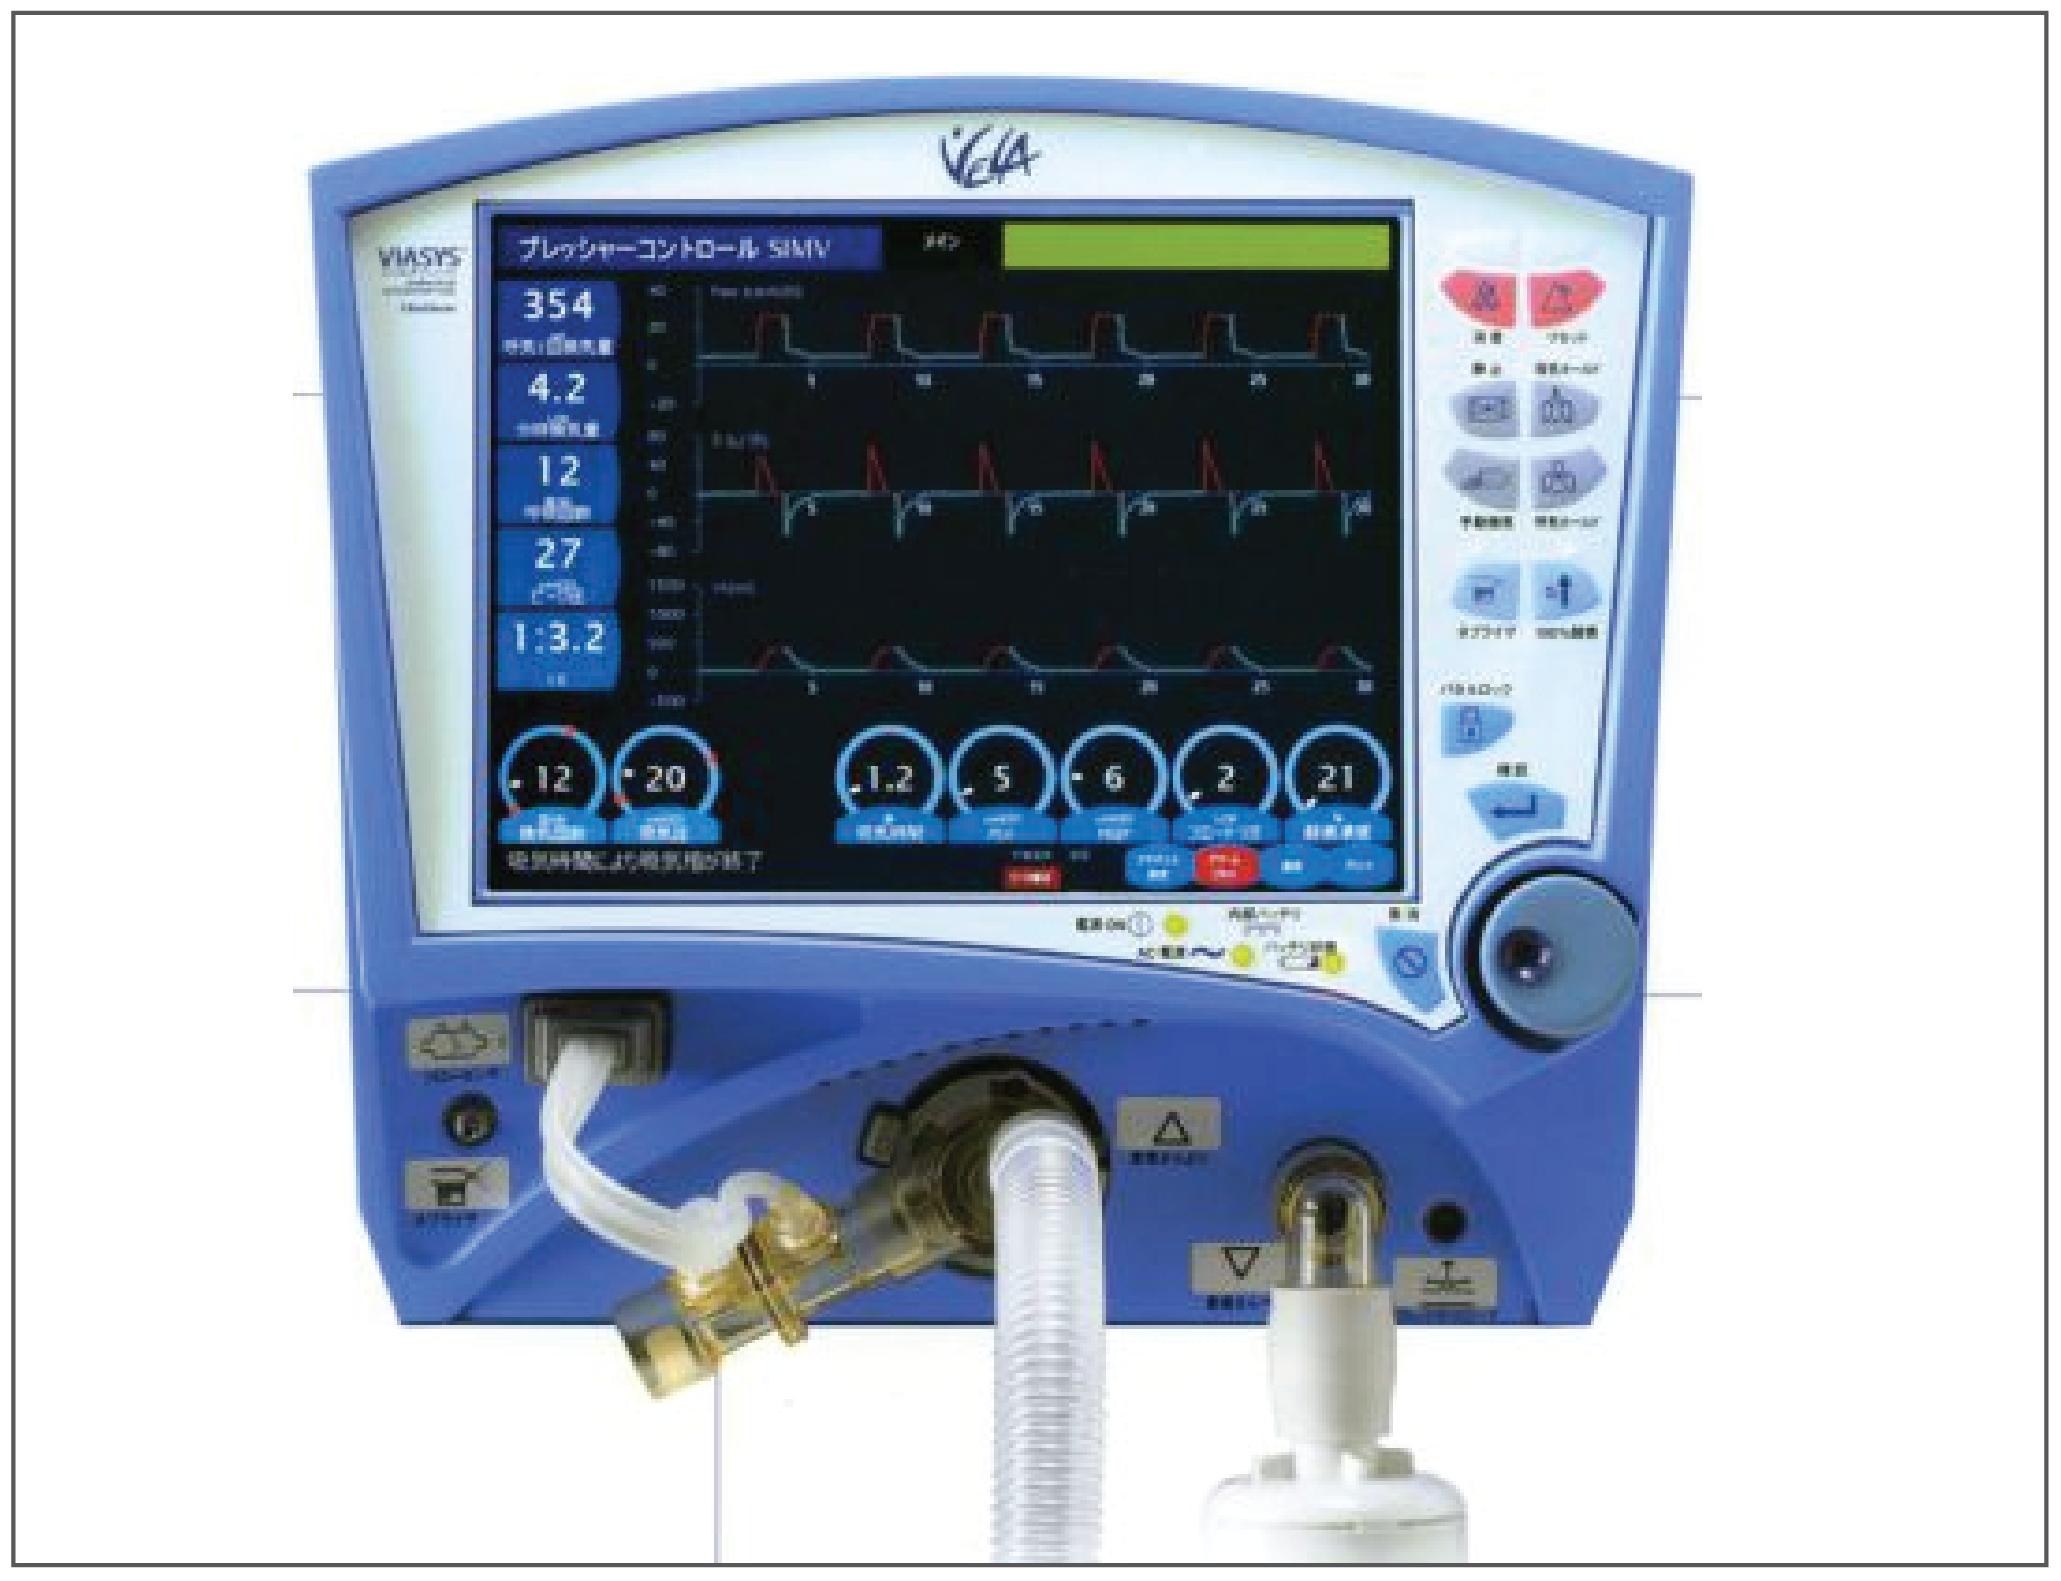 Fy-3020 Resuscitation Ambulance Ventilator Machine - Buy ...  |Ventilator